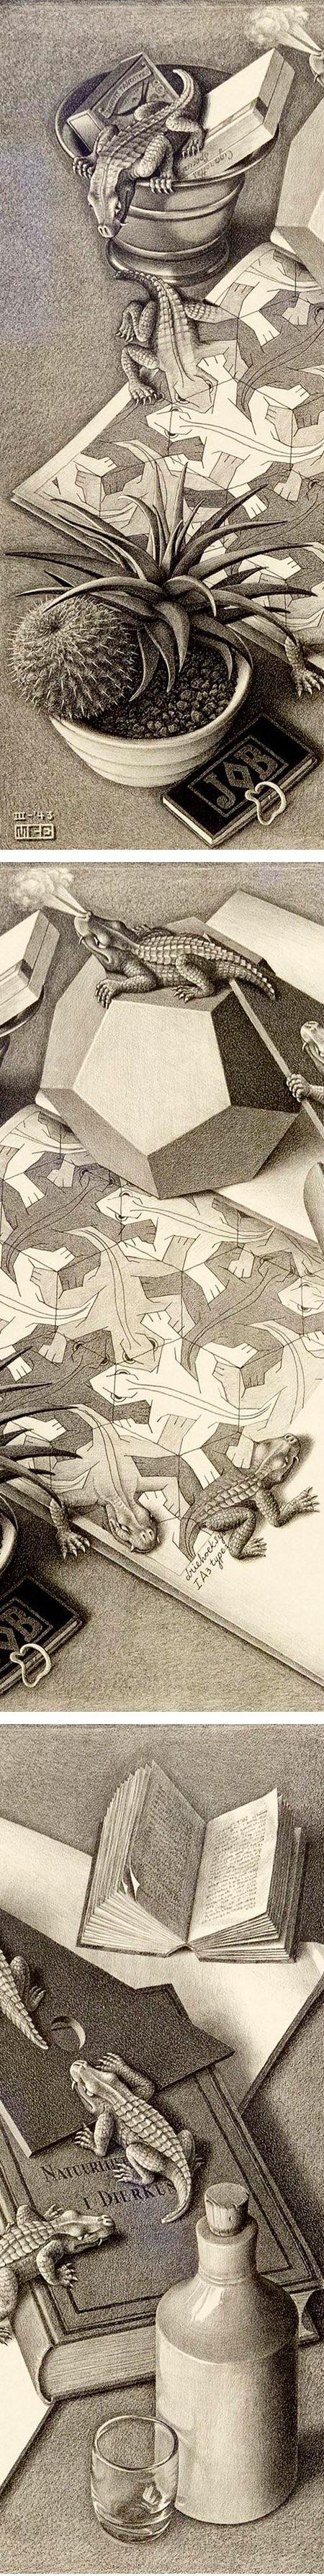 M.C. Escher, Reptiles, lithograph (details)